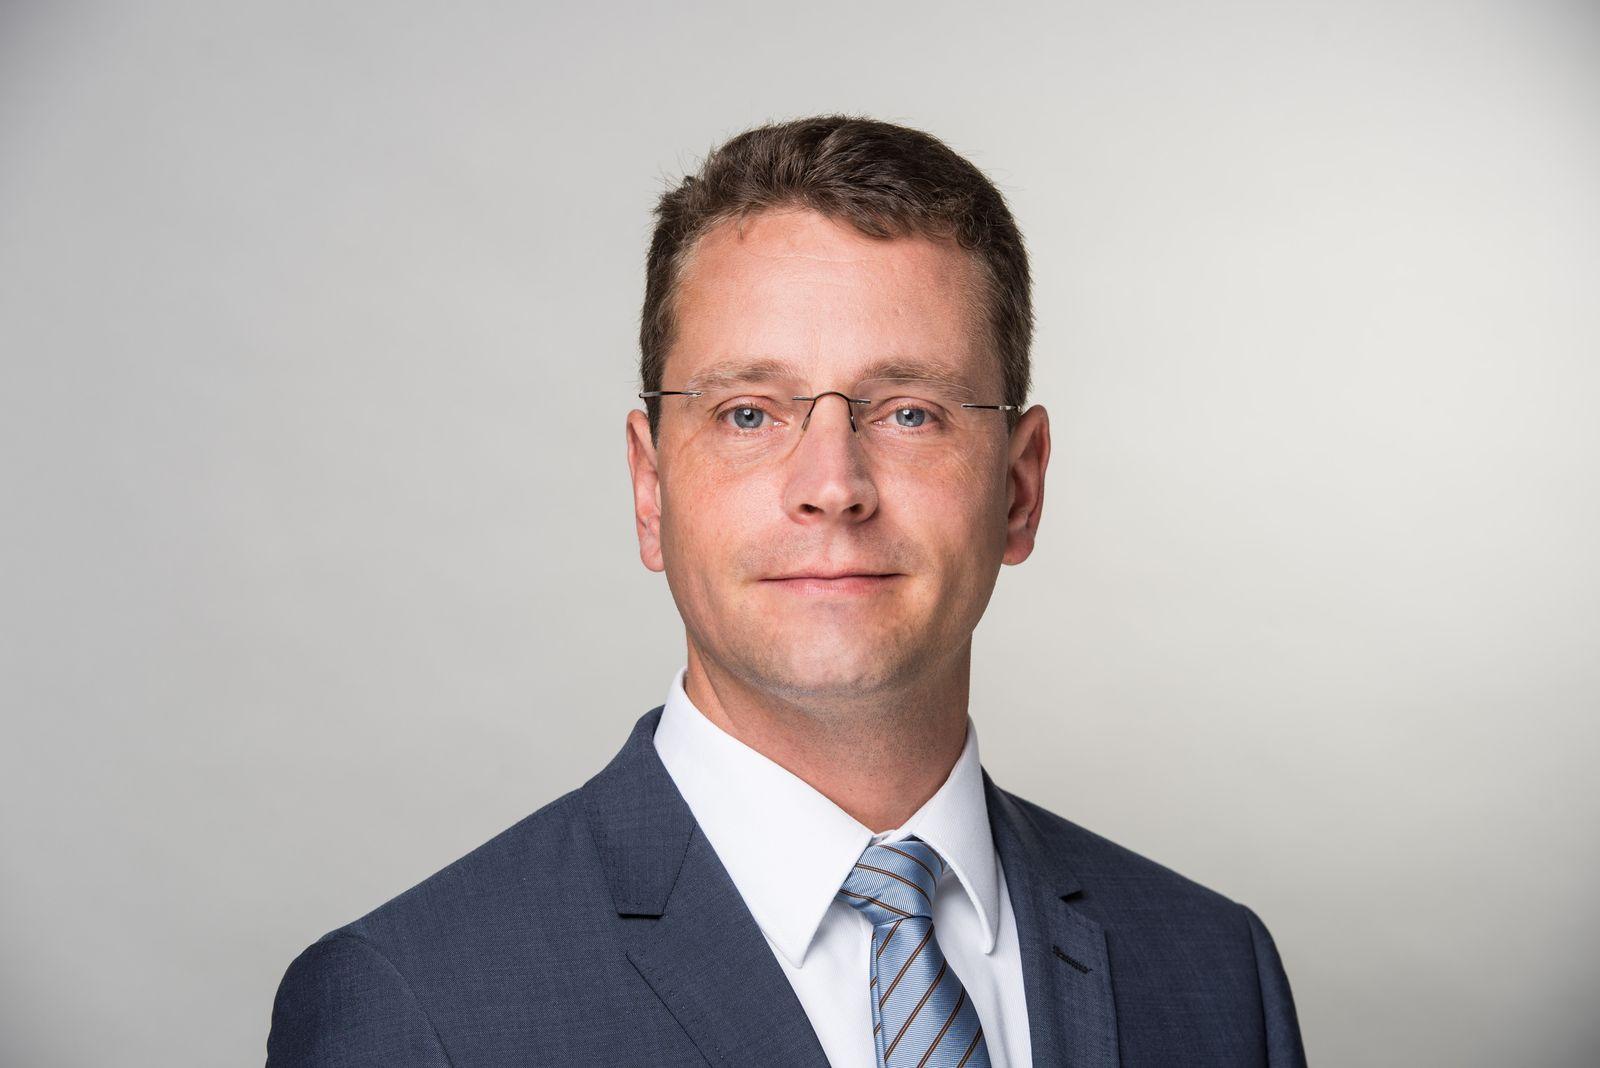 Niels Nauhauser